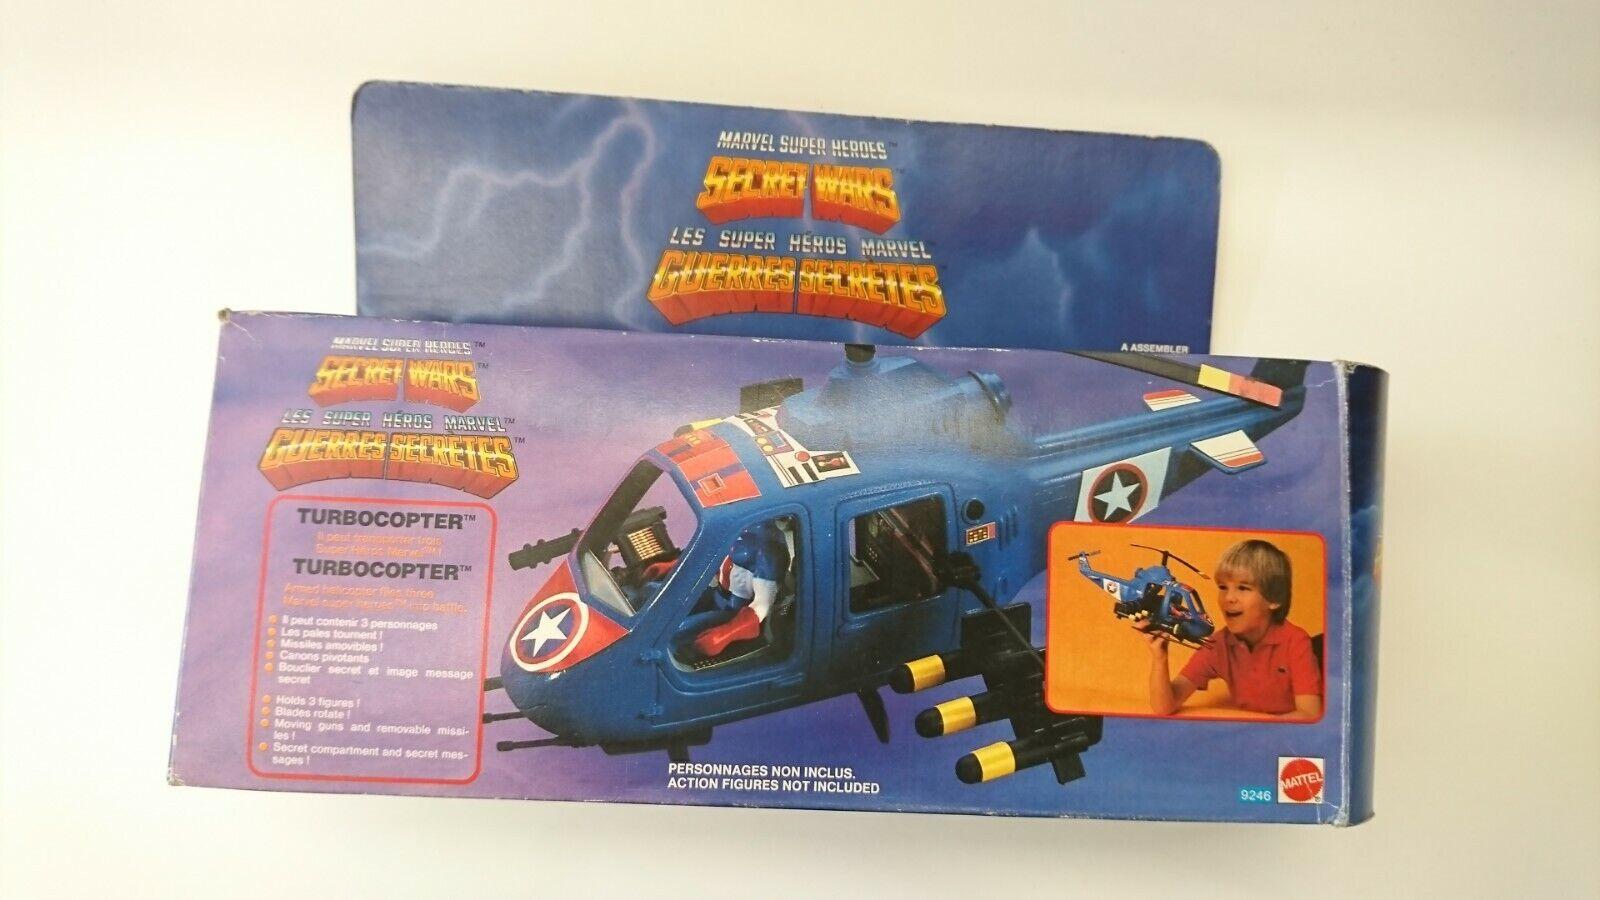 VINTAGE Secret Wars francese turbocopter giocattolo veicolo in scatola 1984